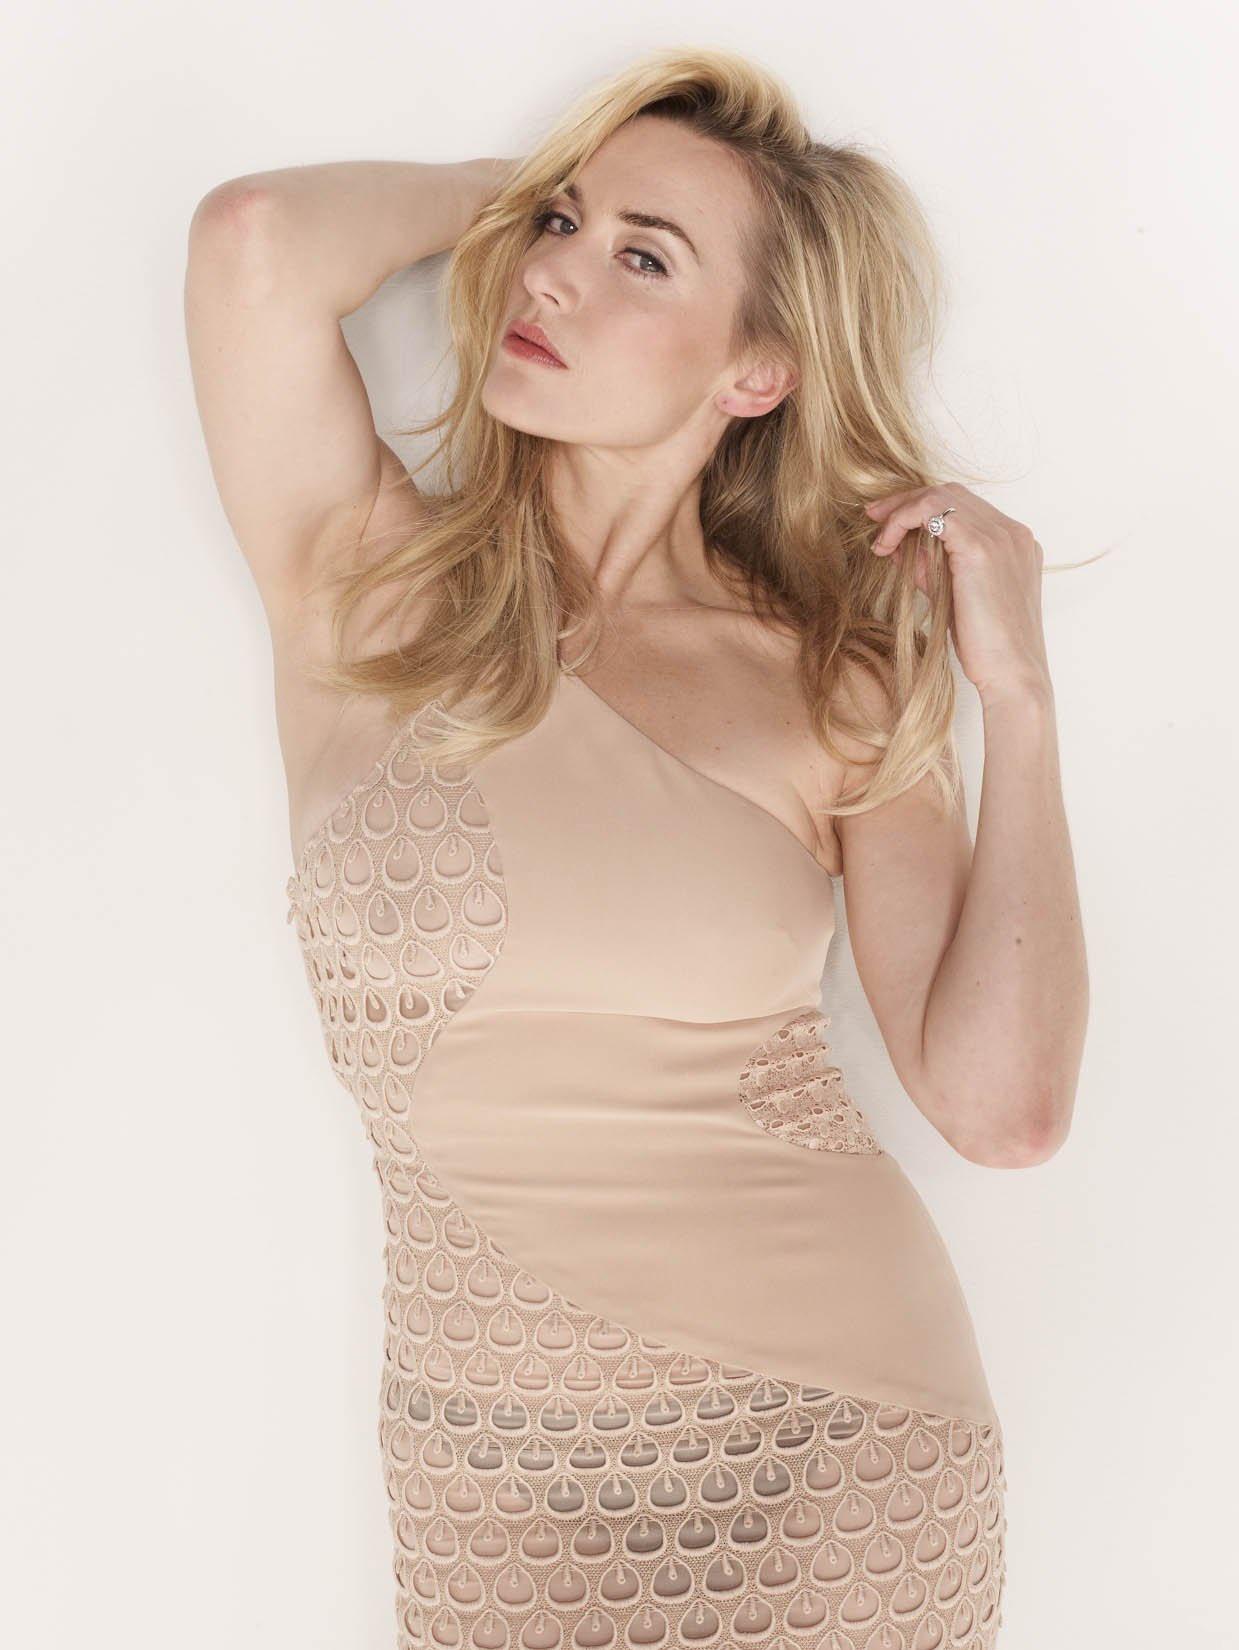 Kate-Winslet-Photoshoot-kate-winslet-23342977-1239-1650